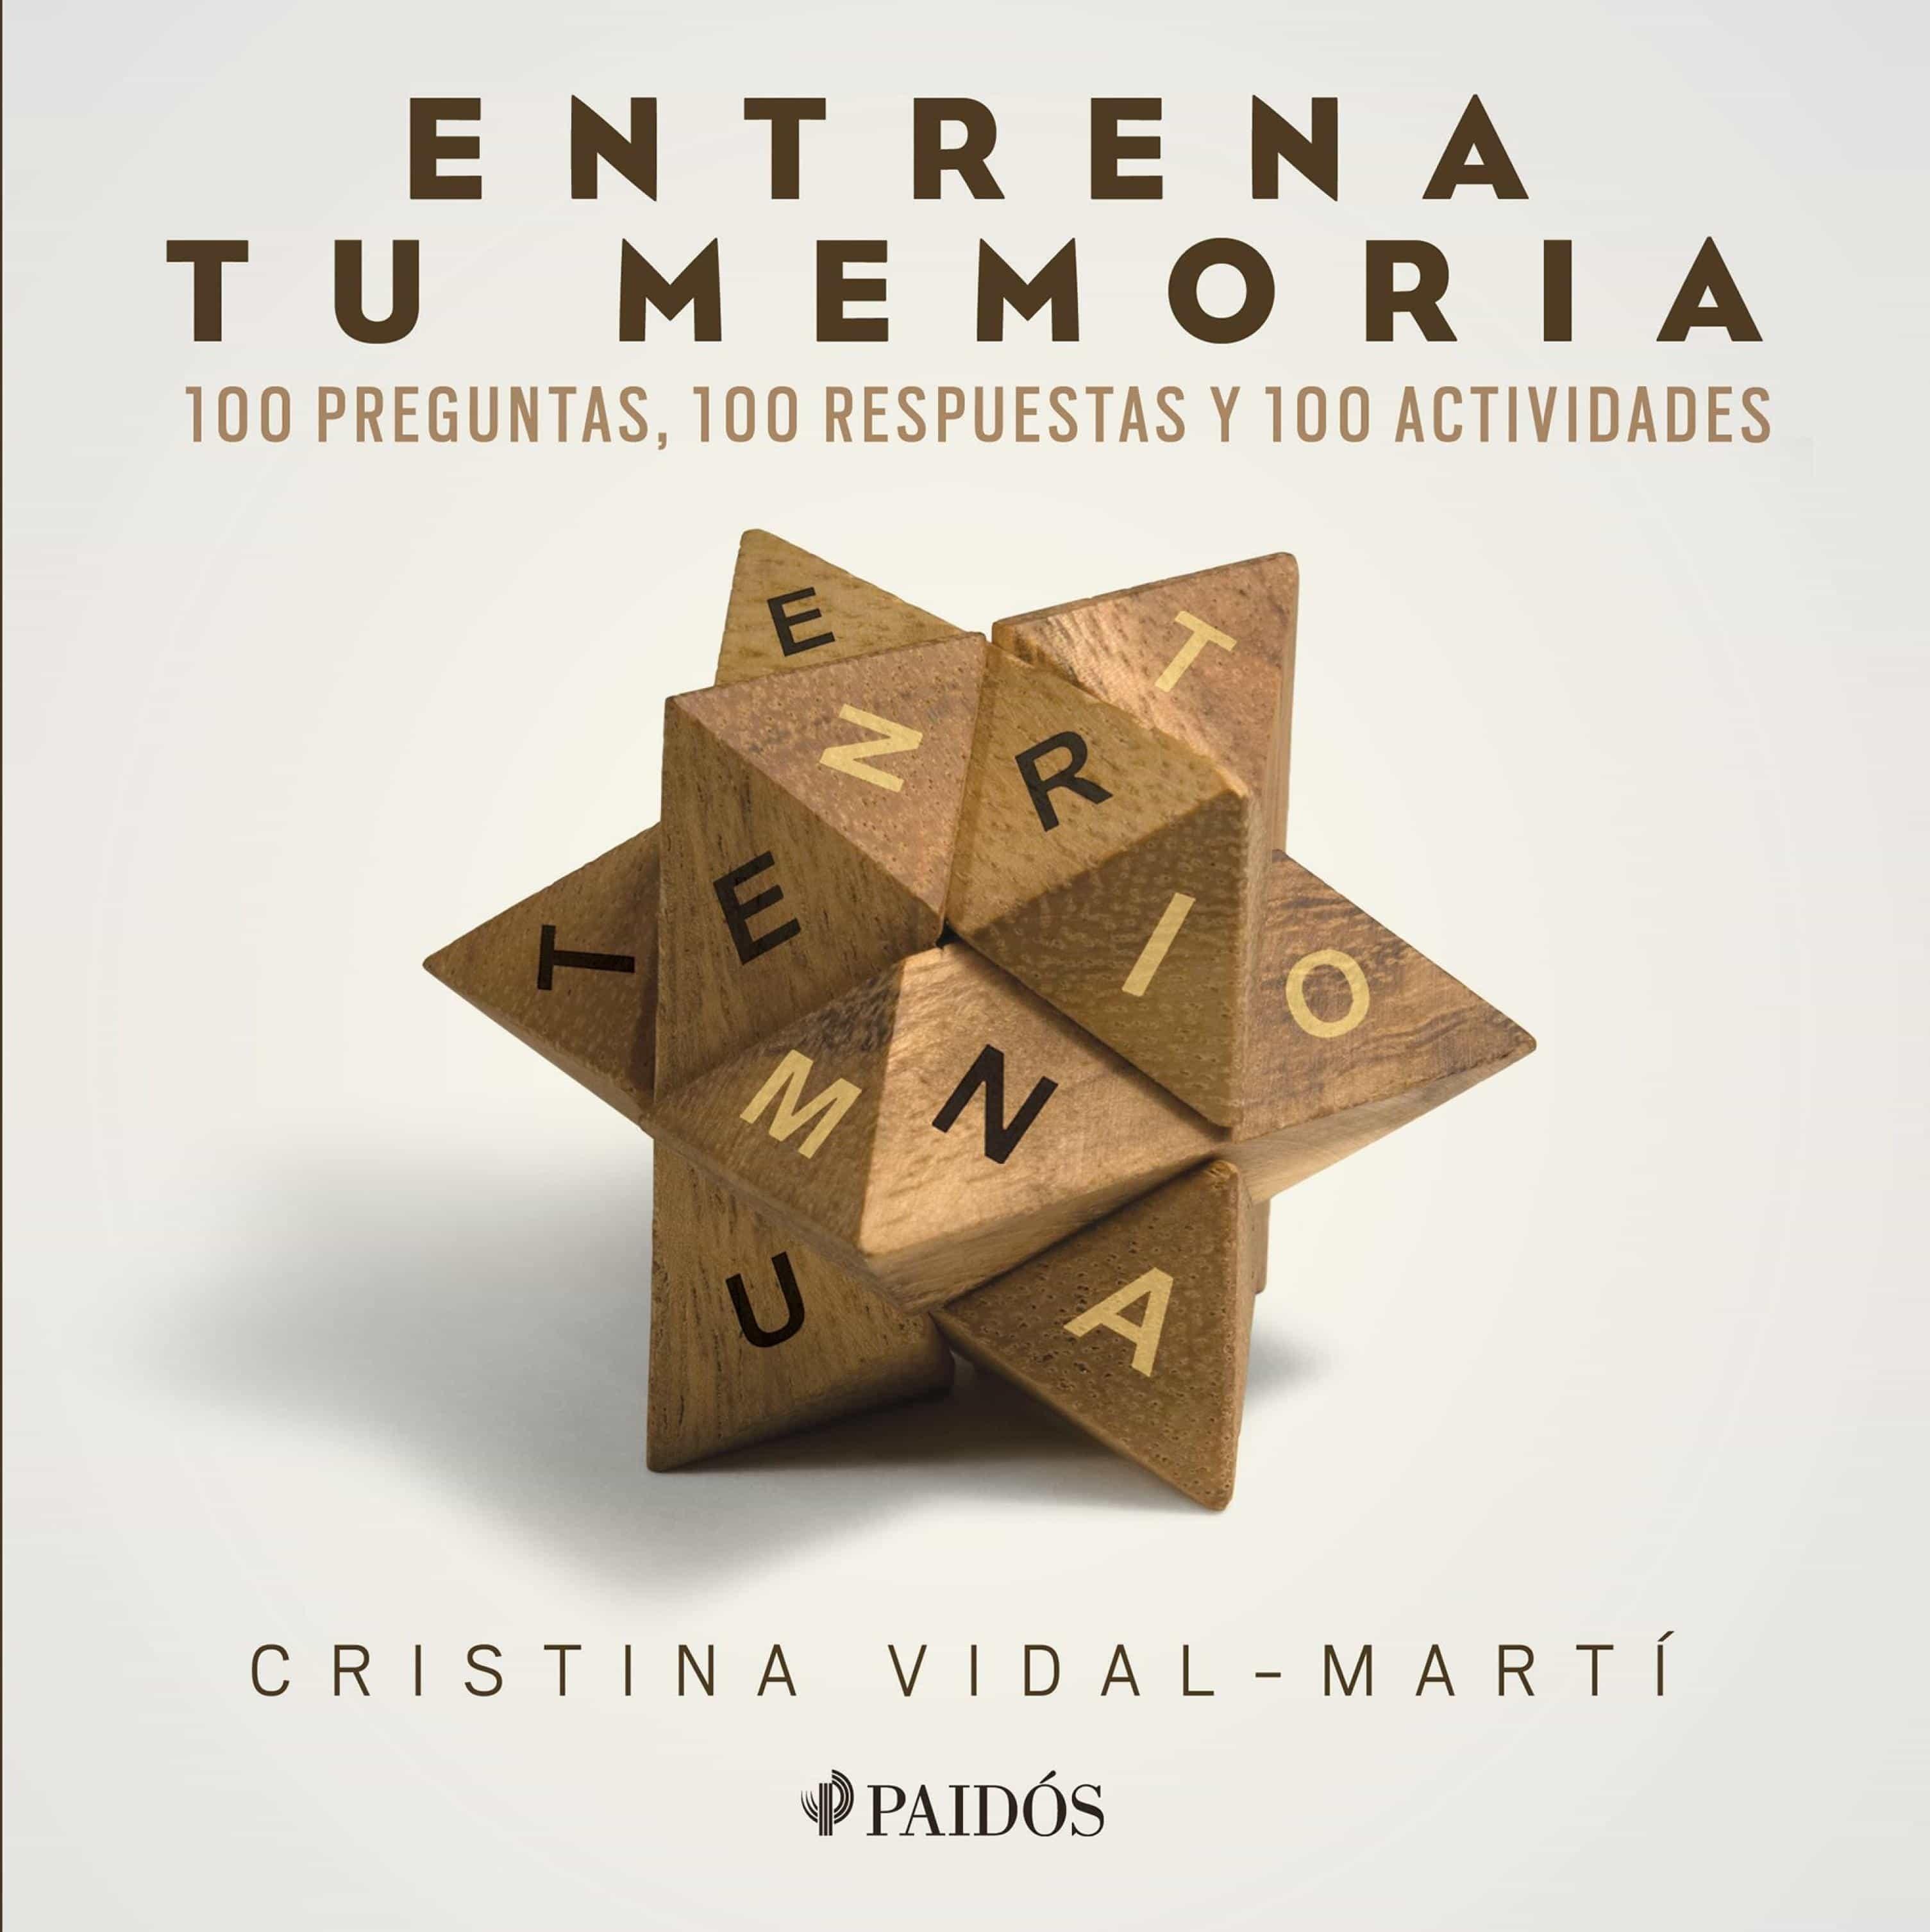 Tu Memoria >> Entrena Tu Memoria Ebook Cristina Vidal Marti Descargar Libro